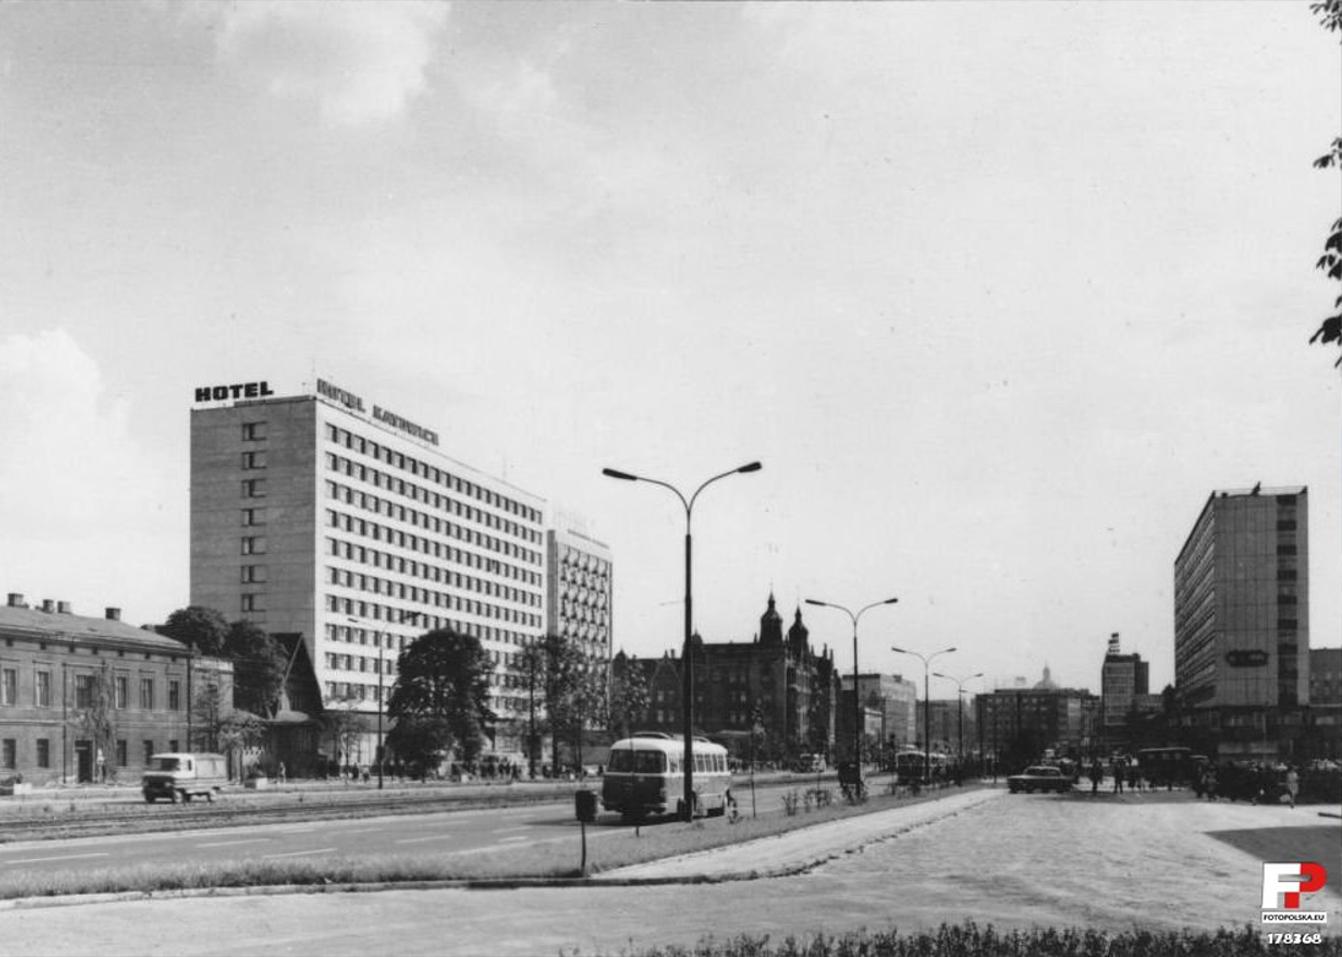 Stary_Dworek_Katowice